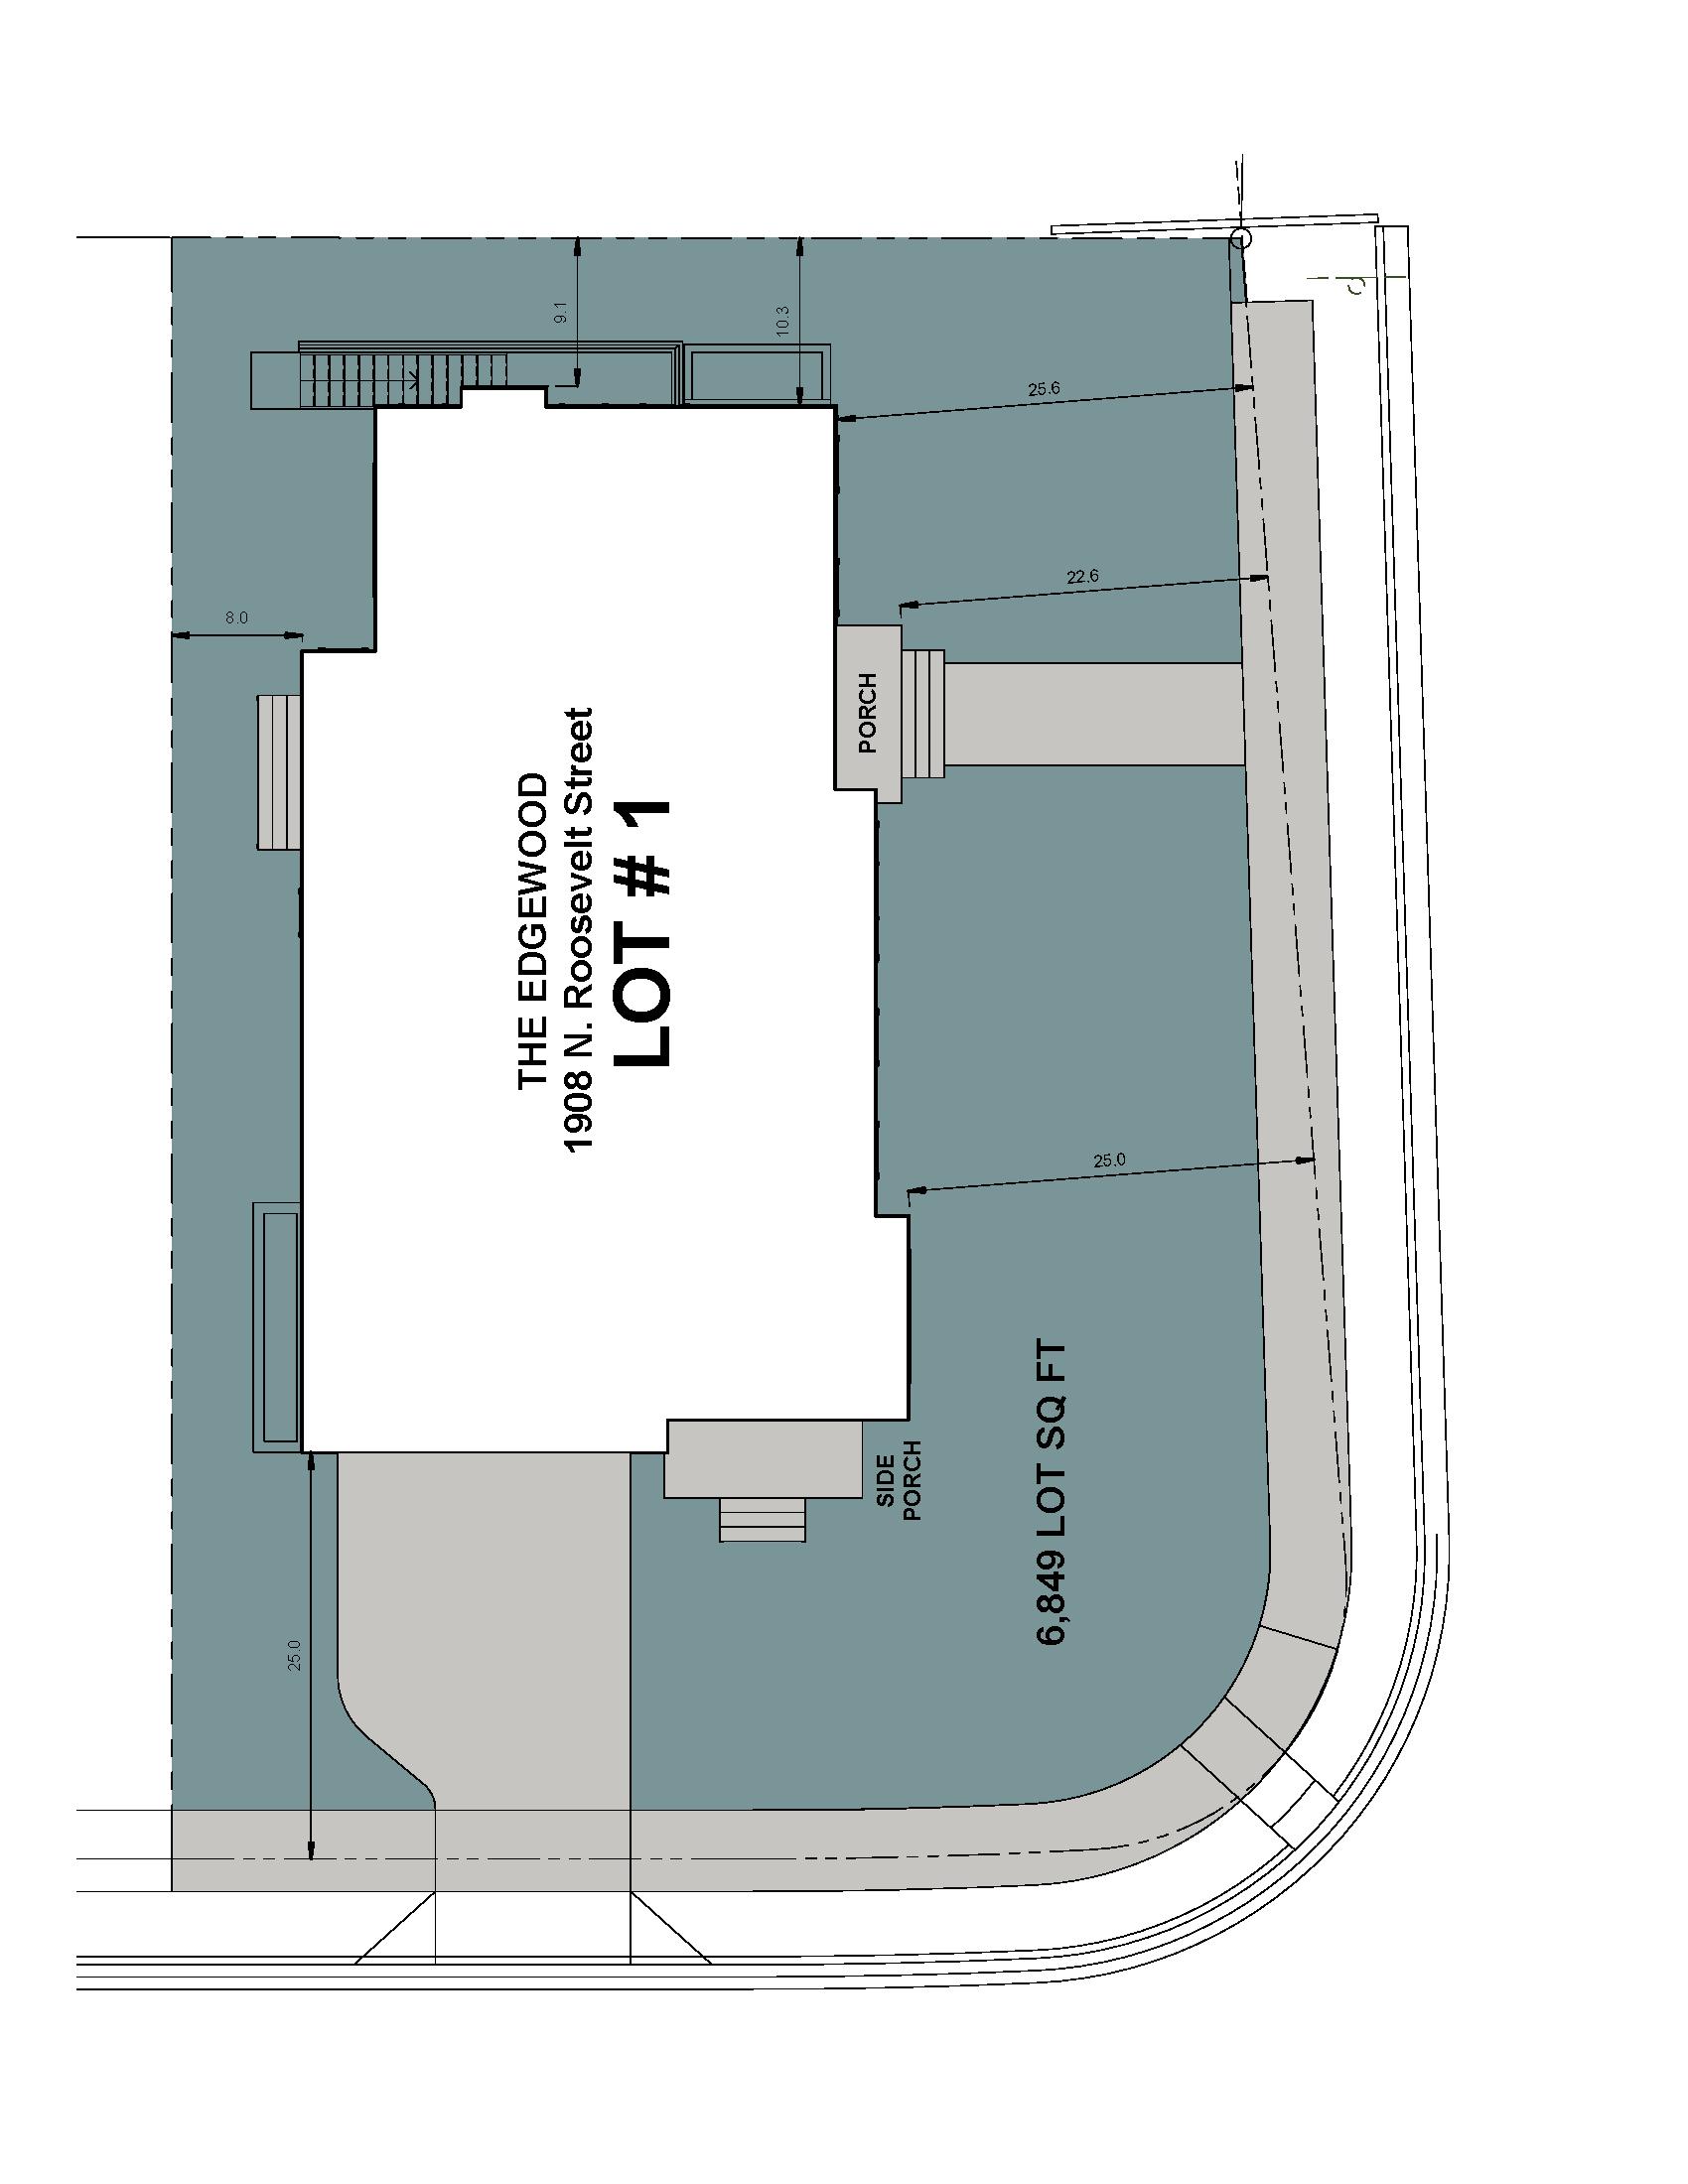 Lot 1 Site Plan-1908 N Roosevelt Street-The Edgewood Model.png